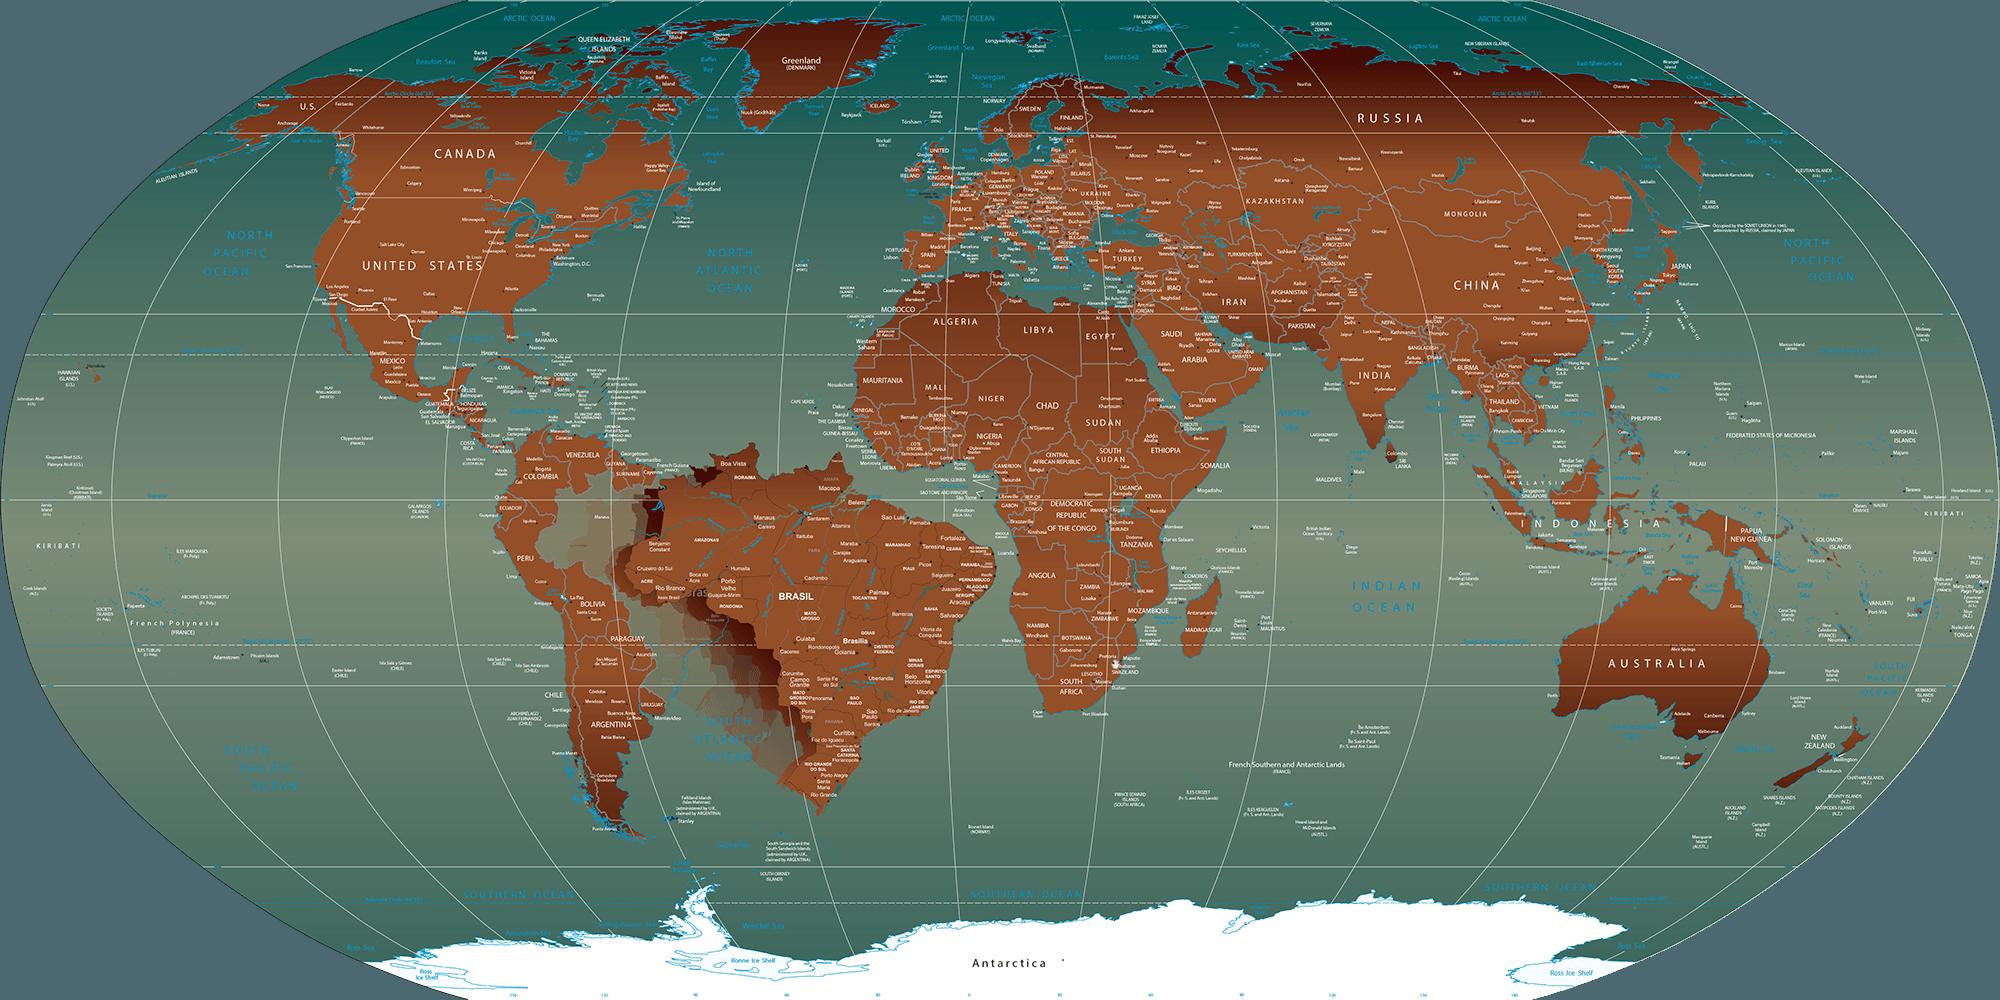 Papel de parede mapa mundi pol tico modelos de mapas - Papel pared mapa mundi ...